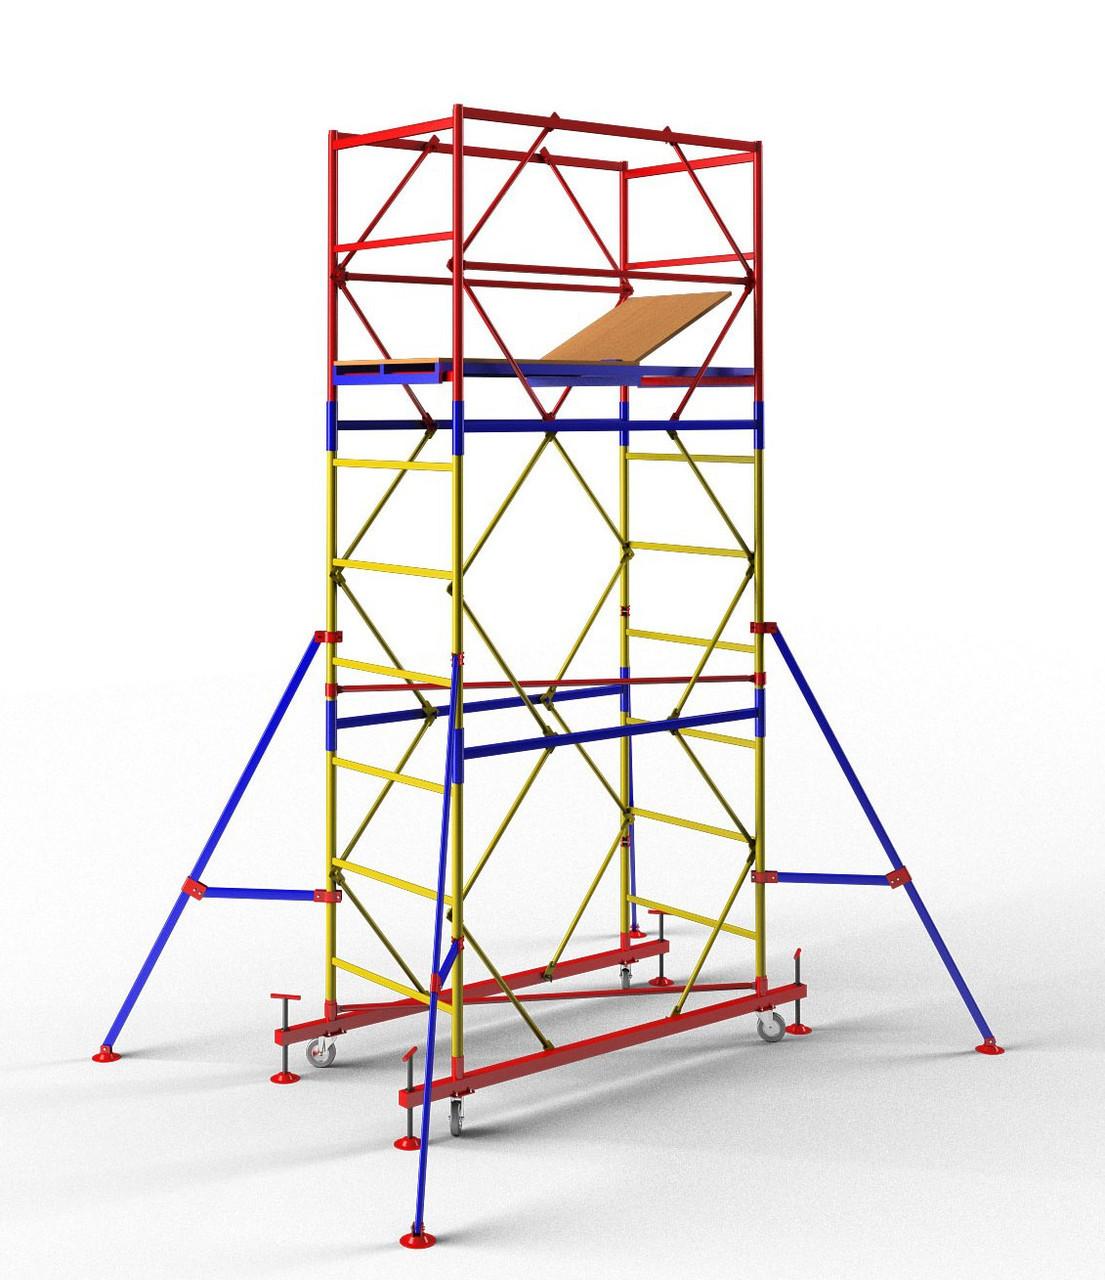 Вышка-тура мобильная облегченная 1,2 х 2,0 м (5+1) Раб.высота 8,6 м